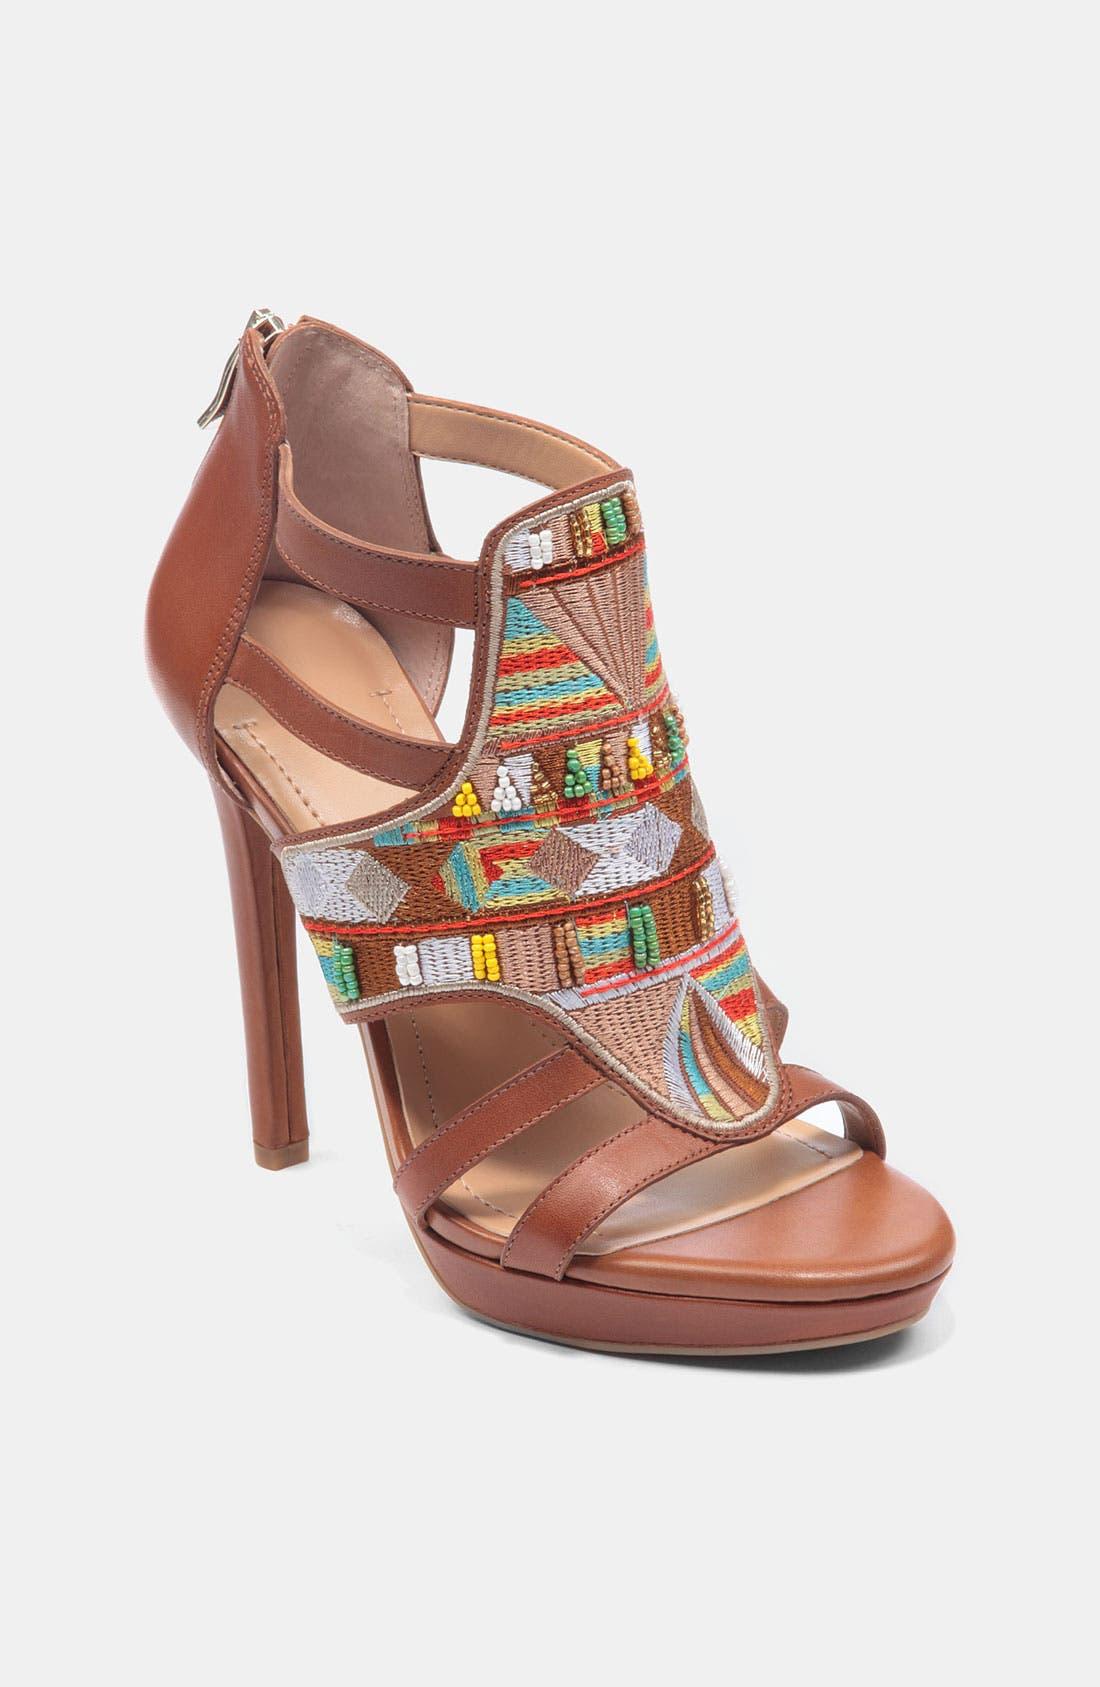 Alternate Image 1 Selected - BCBGeneration 'Madria' Sandal